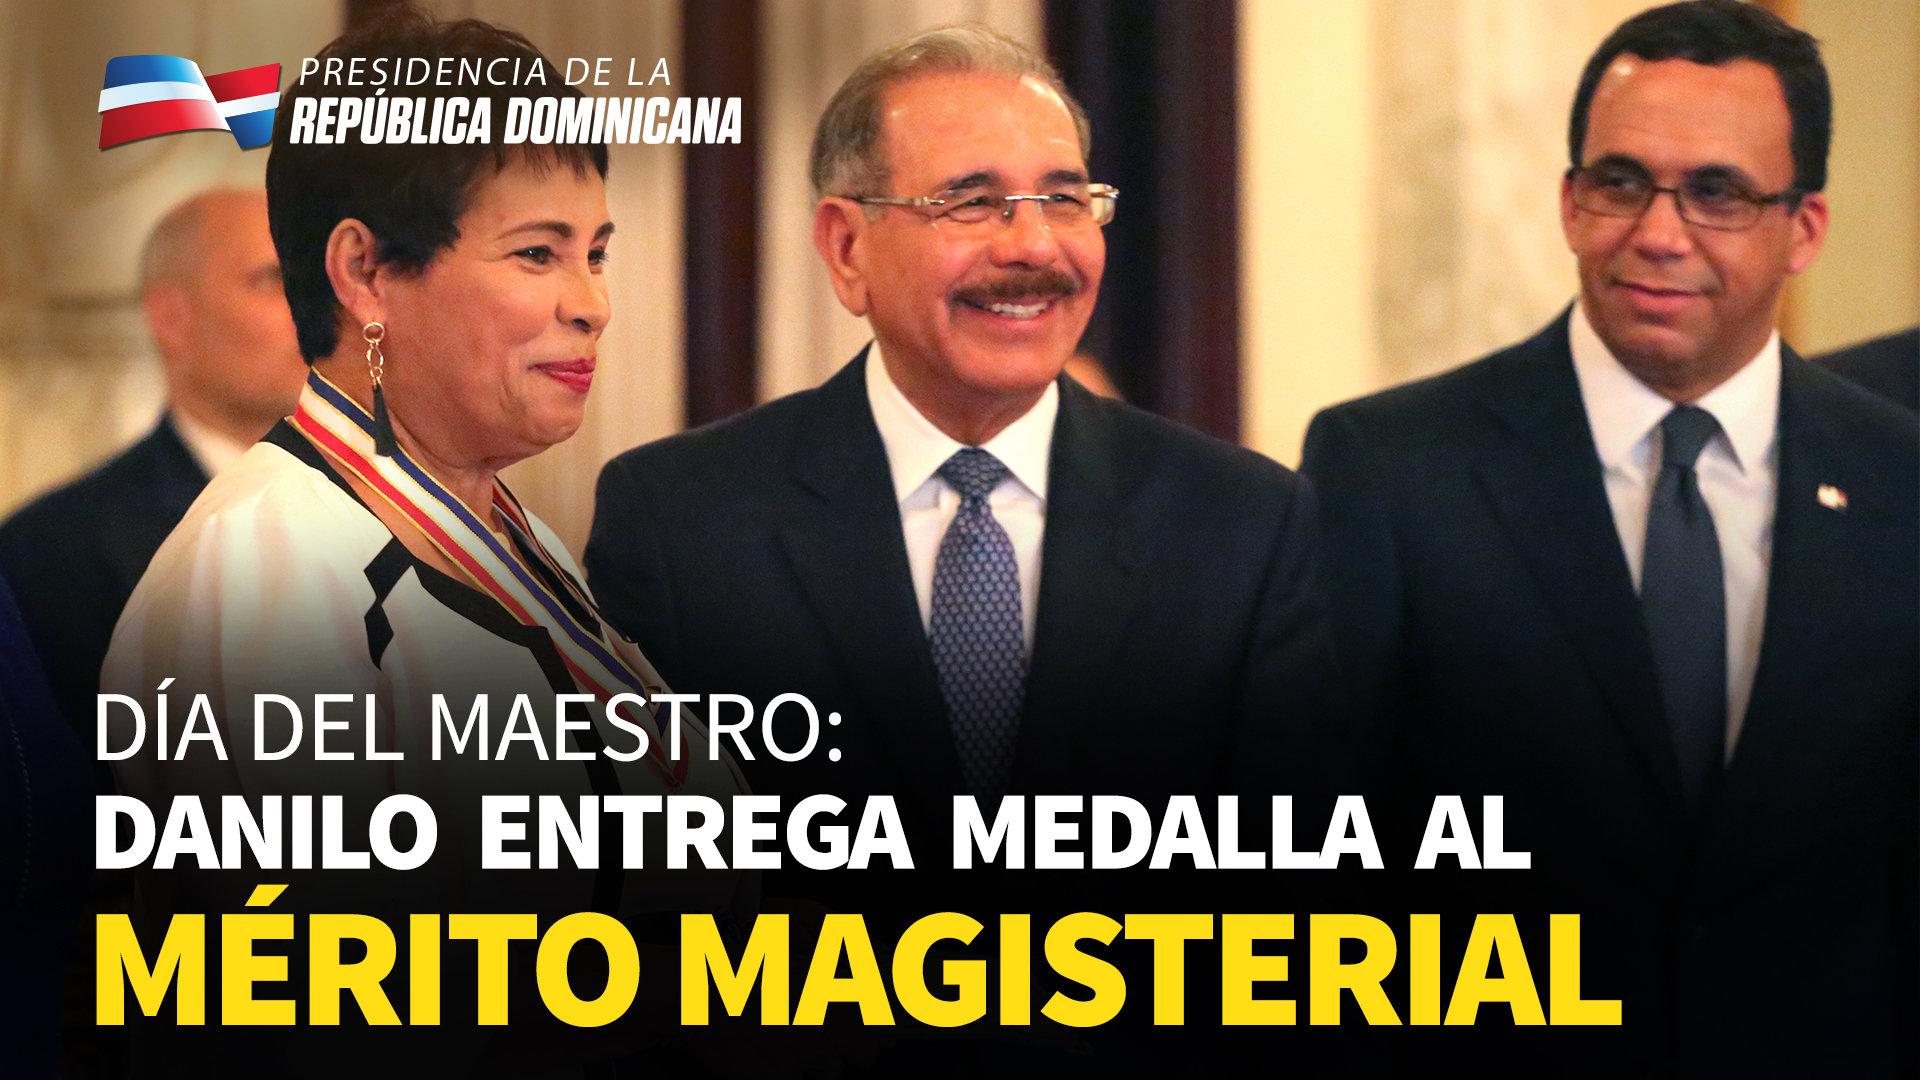 Danilo entrega Medalla al Mérito Magisterial